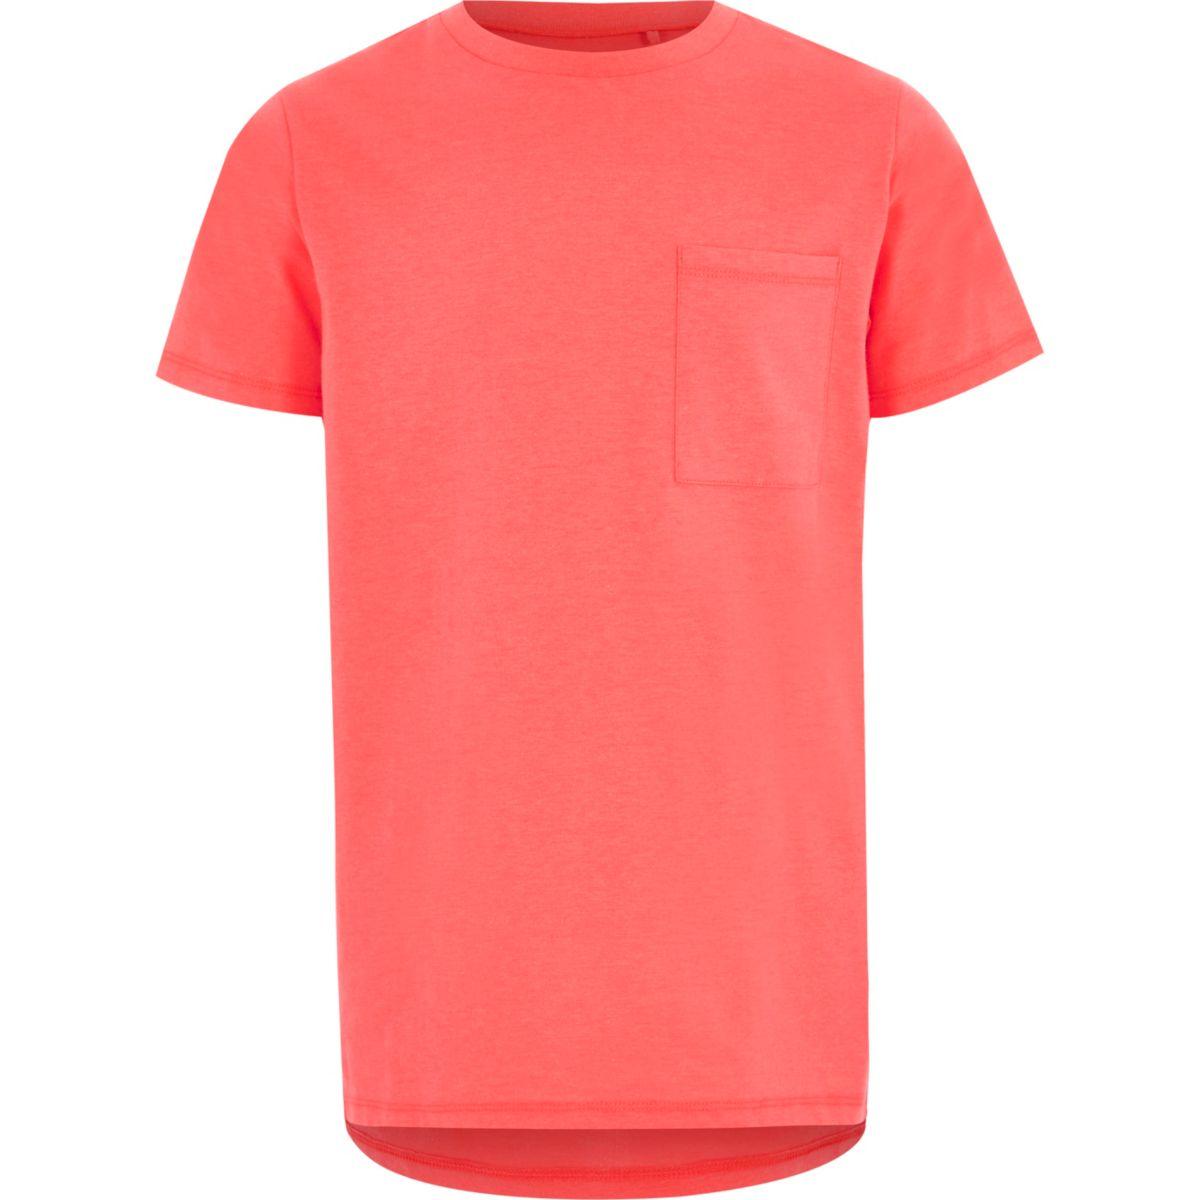 Boys coral fluro pocket short sleeve T-shirt